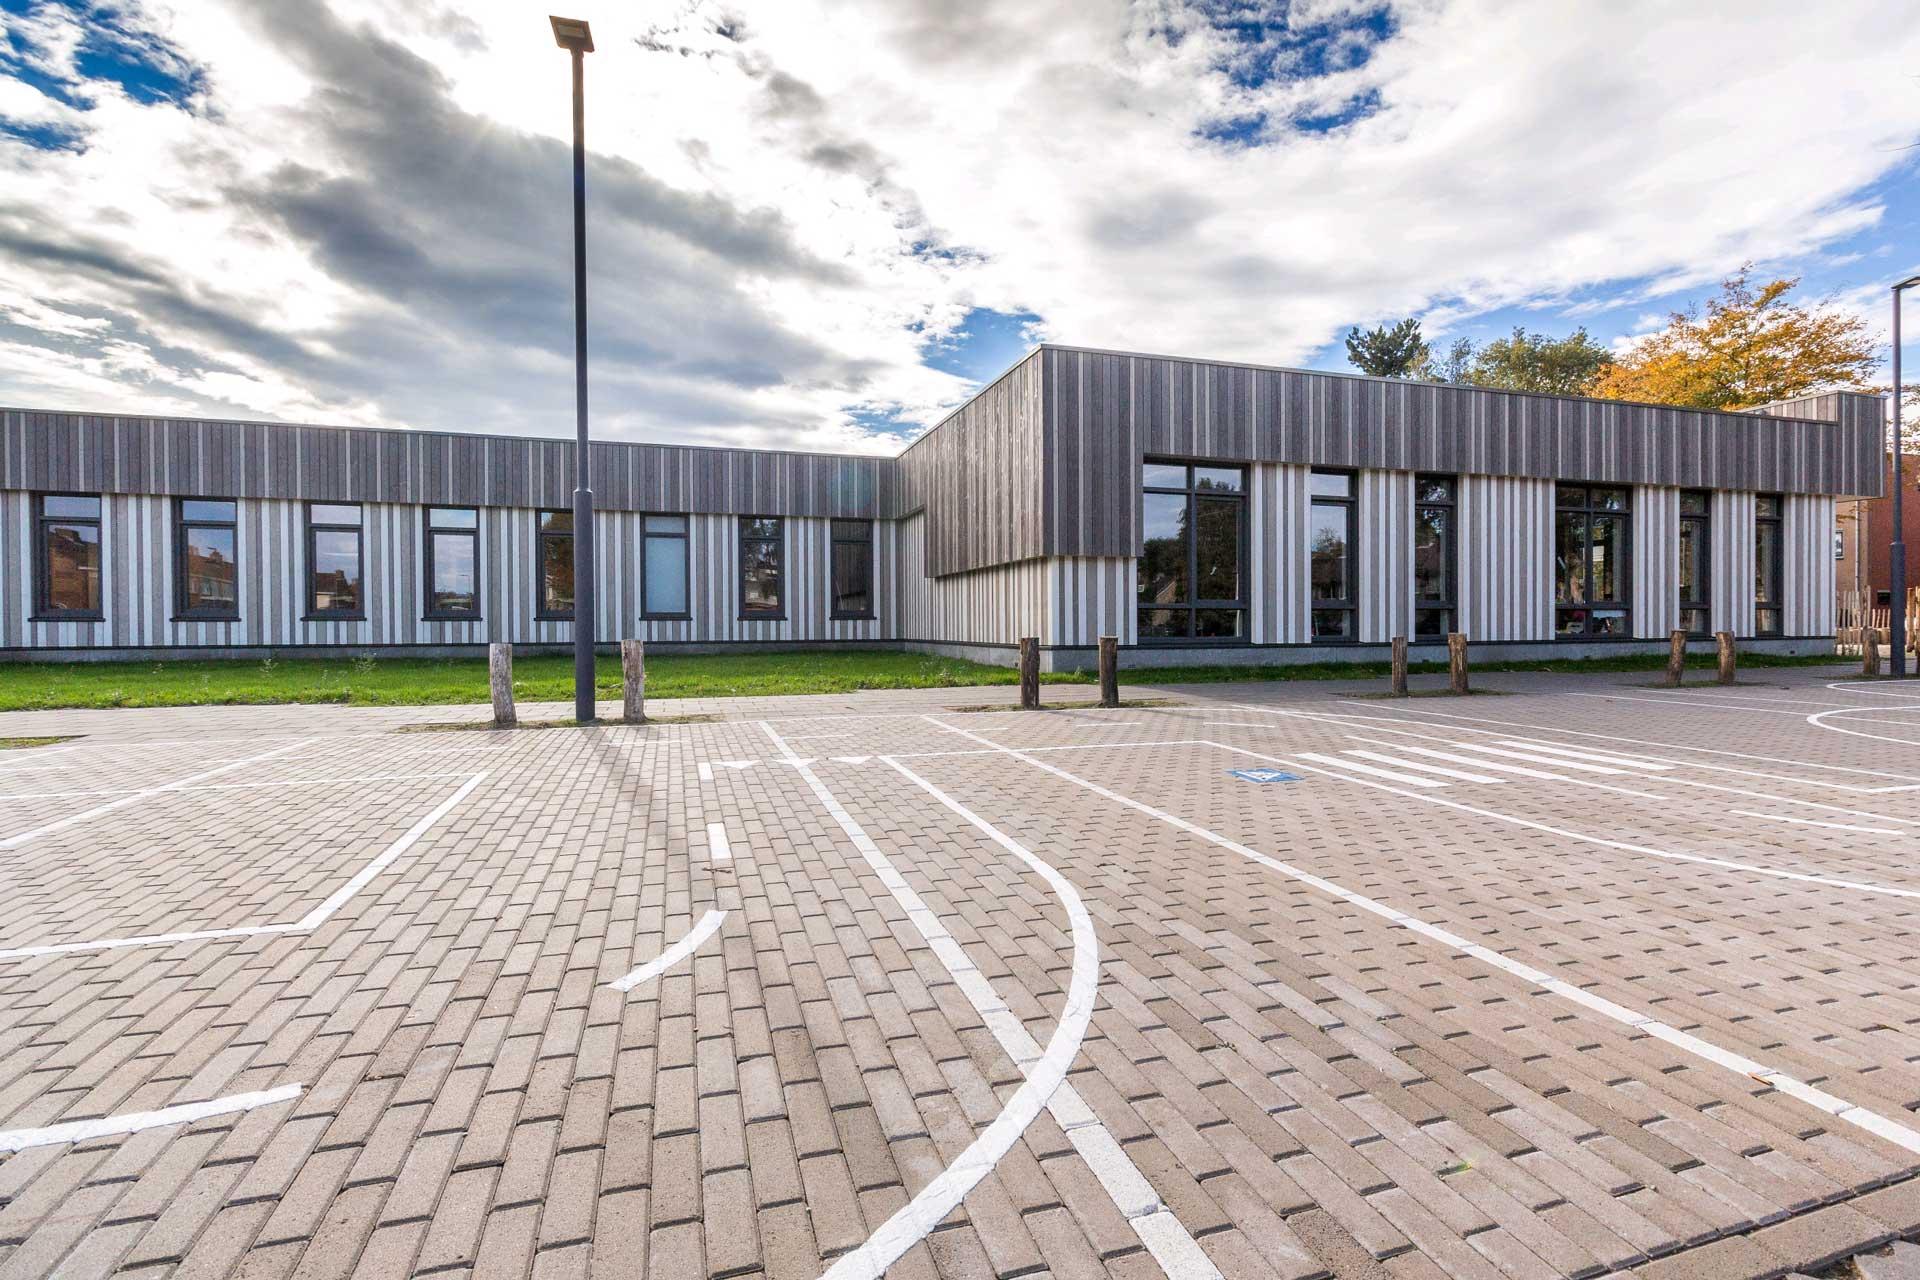 Schoolgebouw KPO SBO De Sponder en SO De Fakkel, Zonneboom, Roosendaal, SoulWood Special Colour, houten gevelbekleding, BVR, schoolgebouw, Douglas